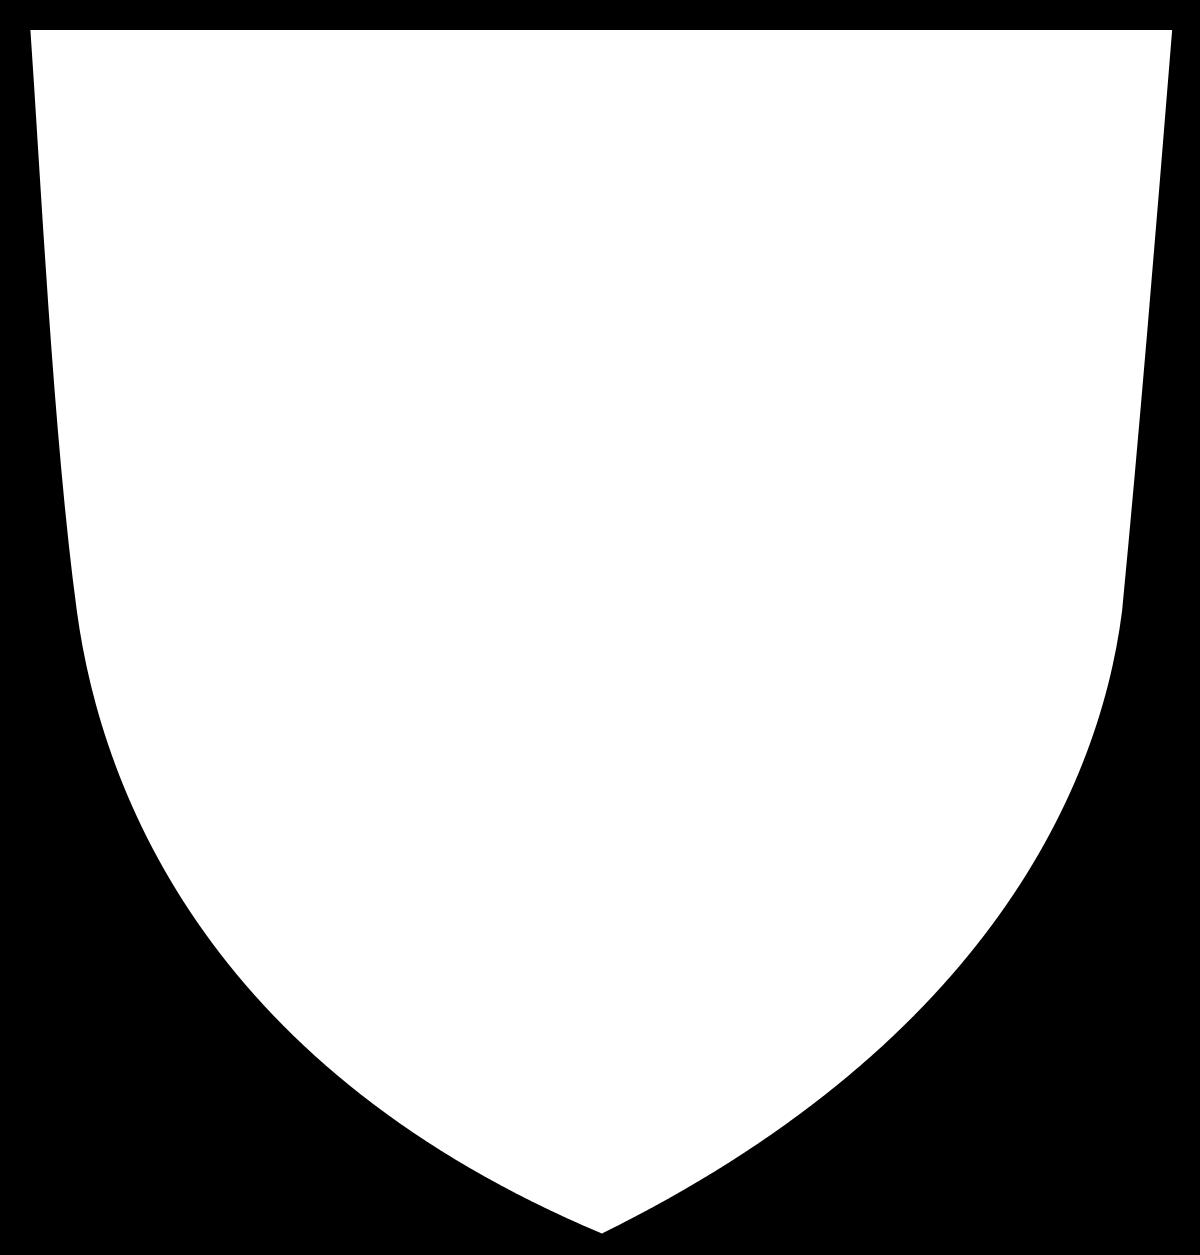 File Wappenschild Spitz Leer Svg Wikimedia Commons